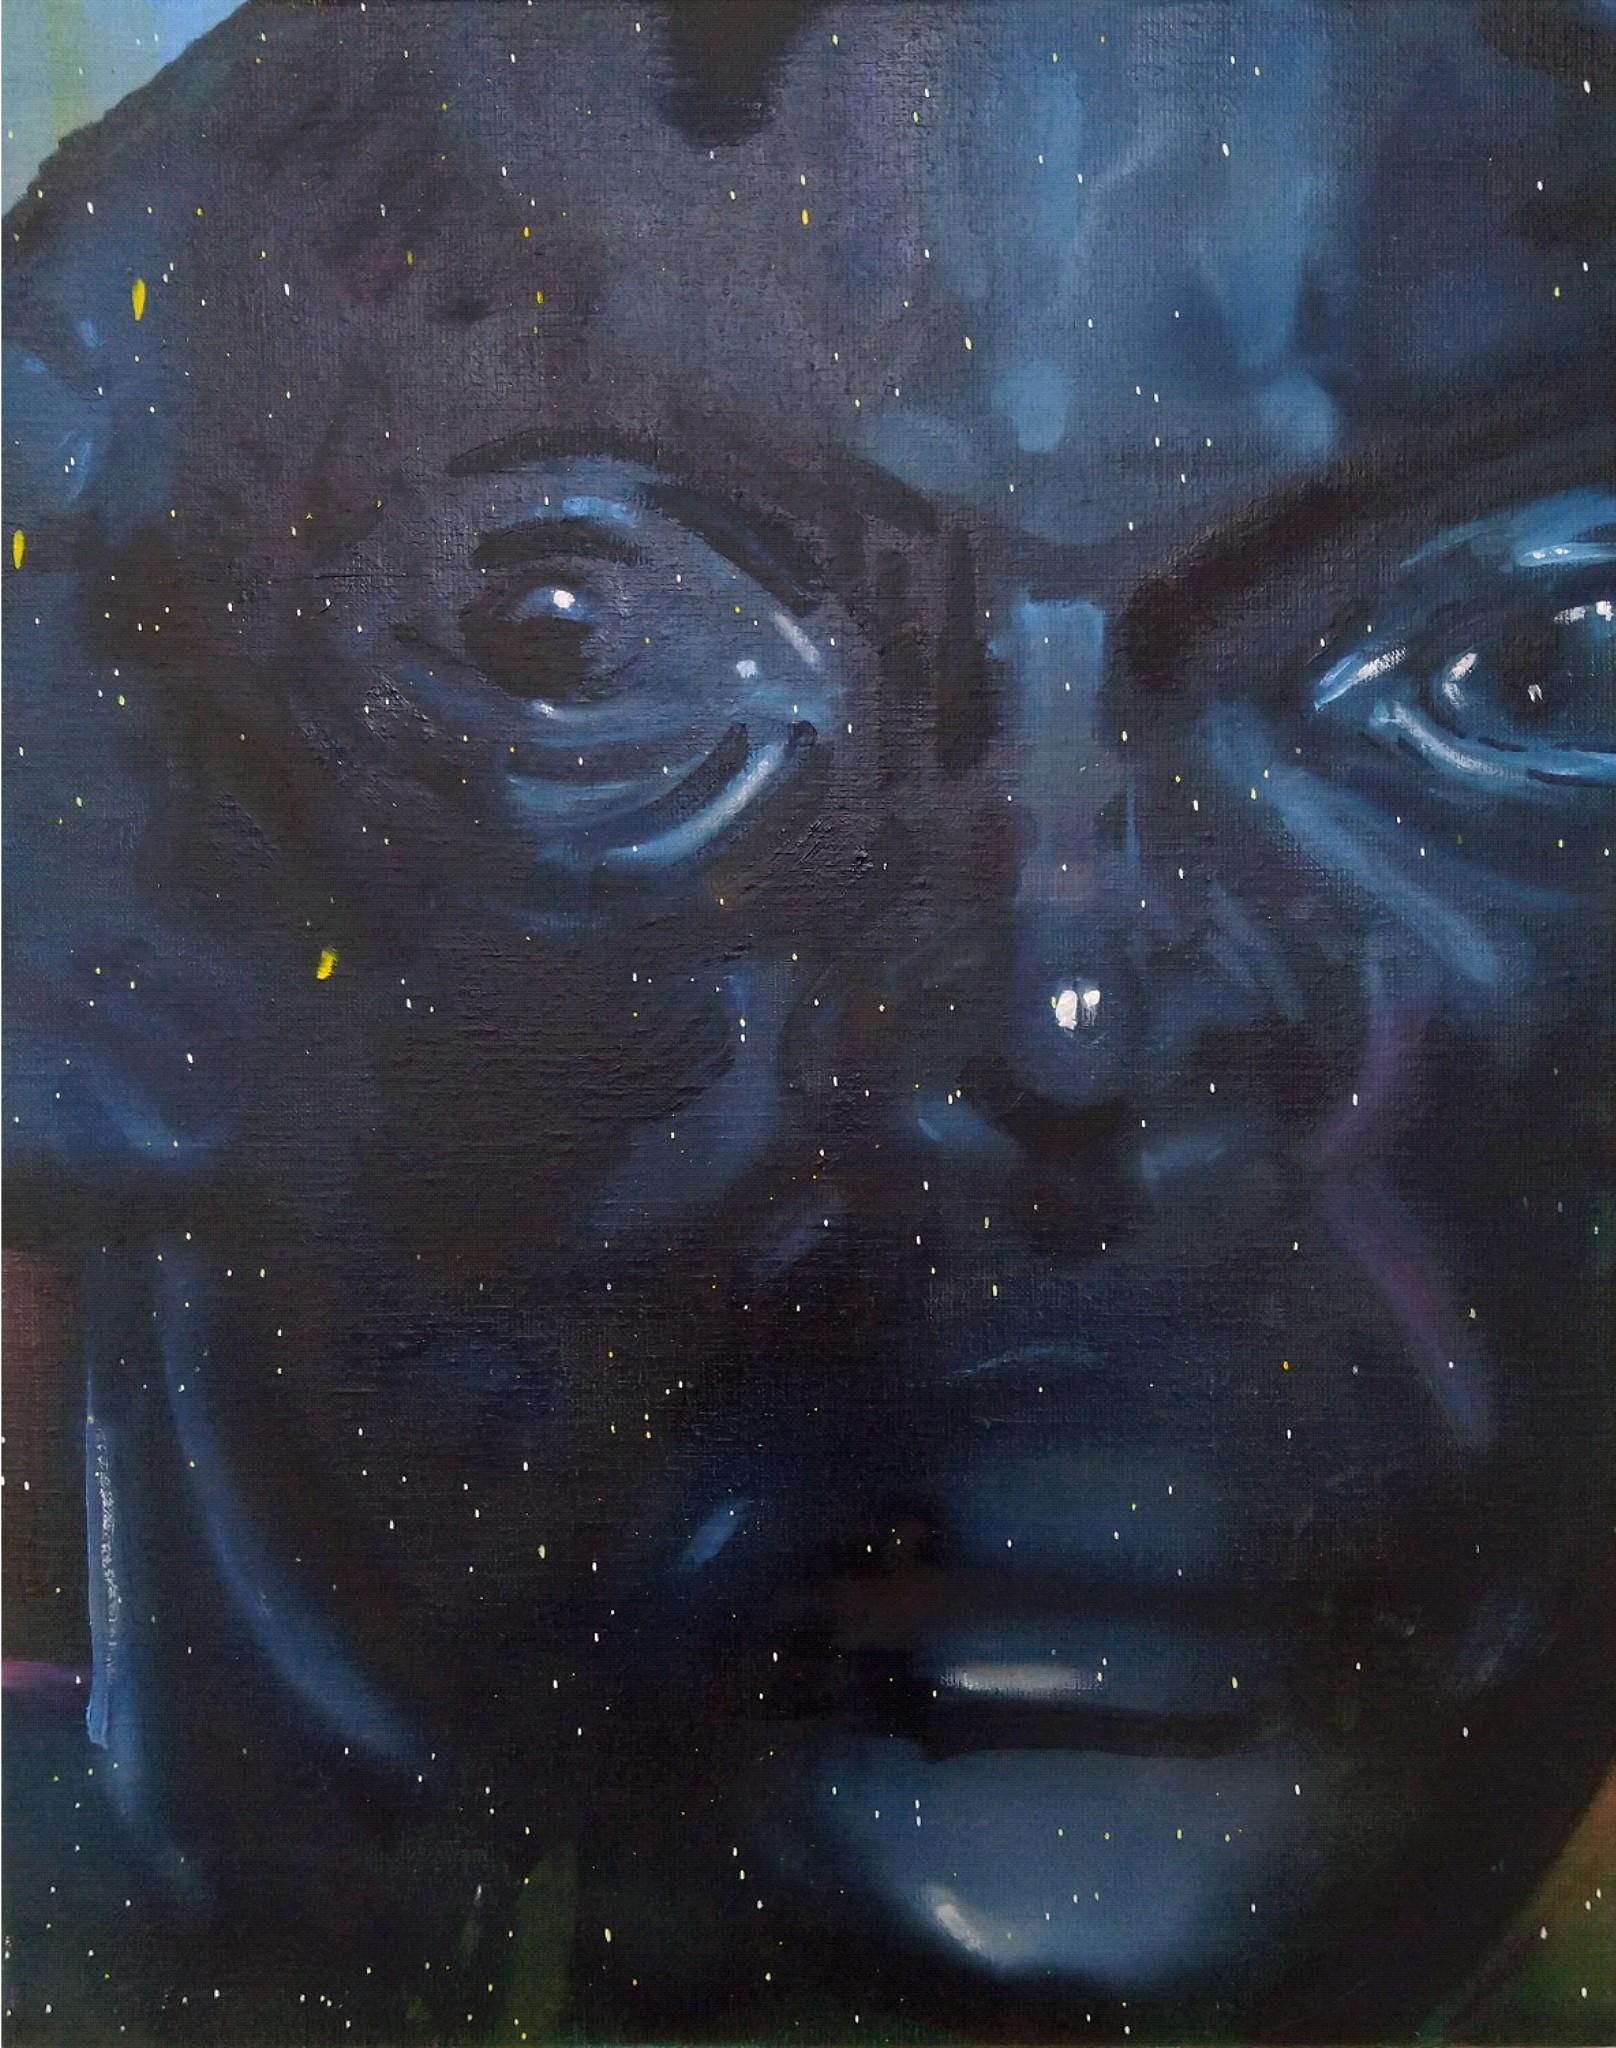 Wouter van de Koot painting sculpture face close up black blue